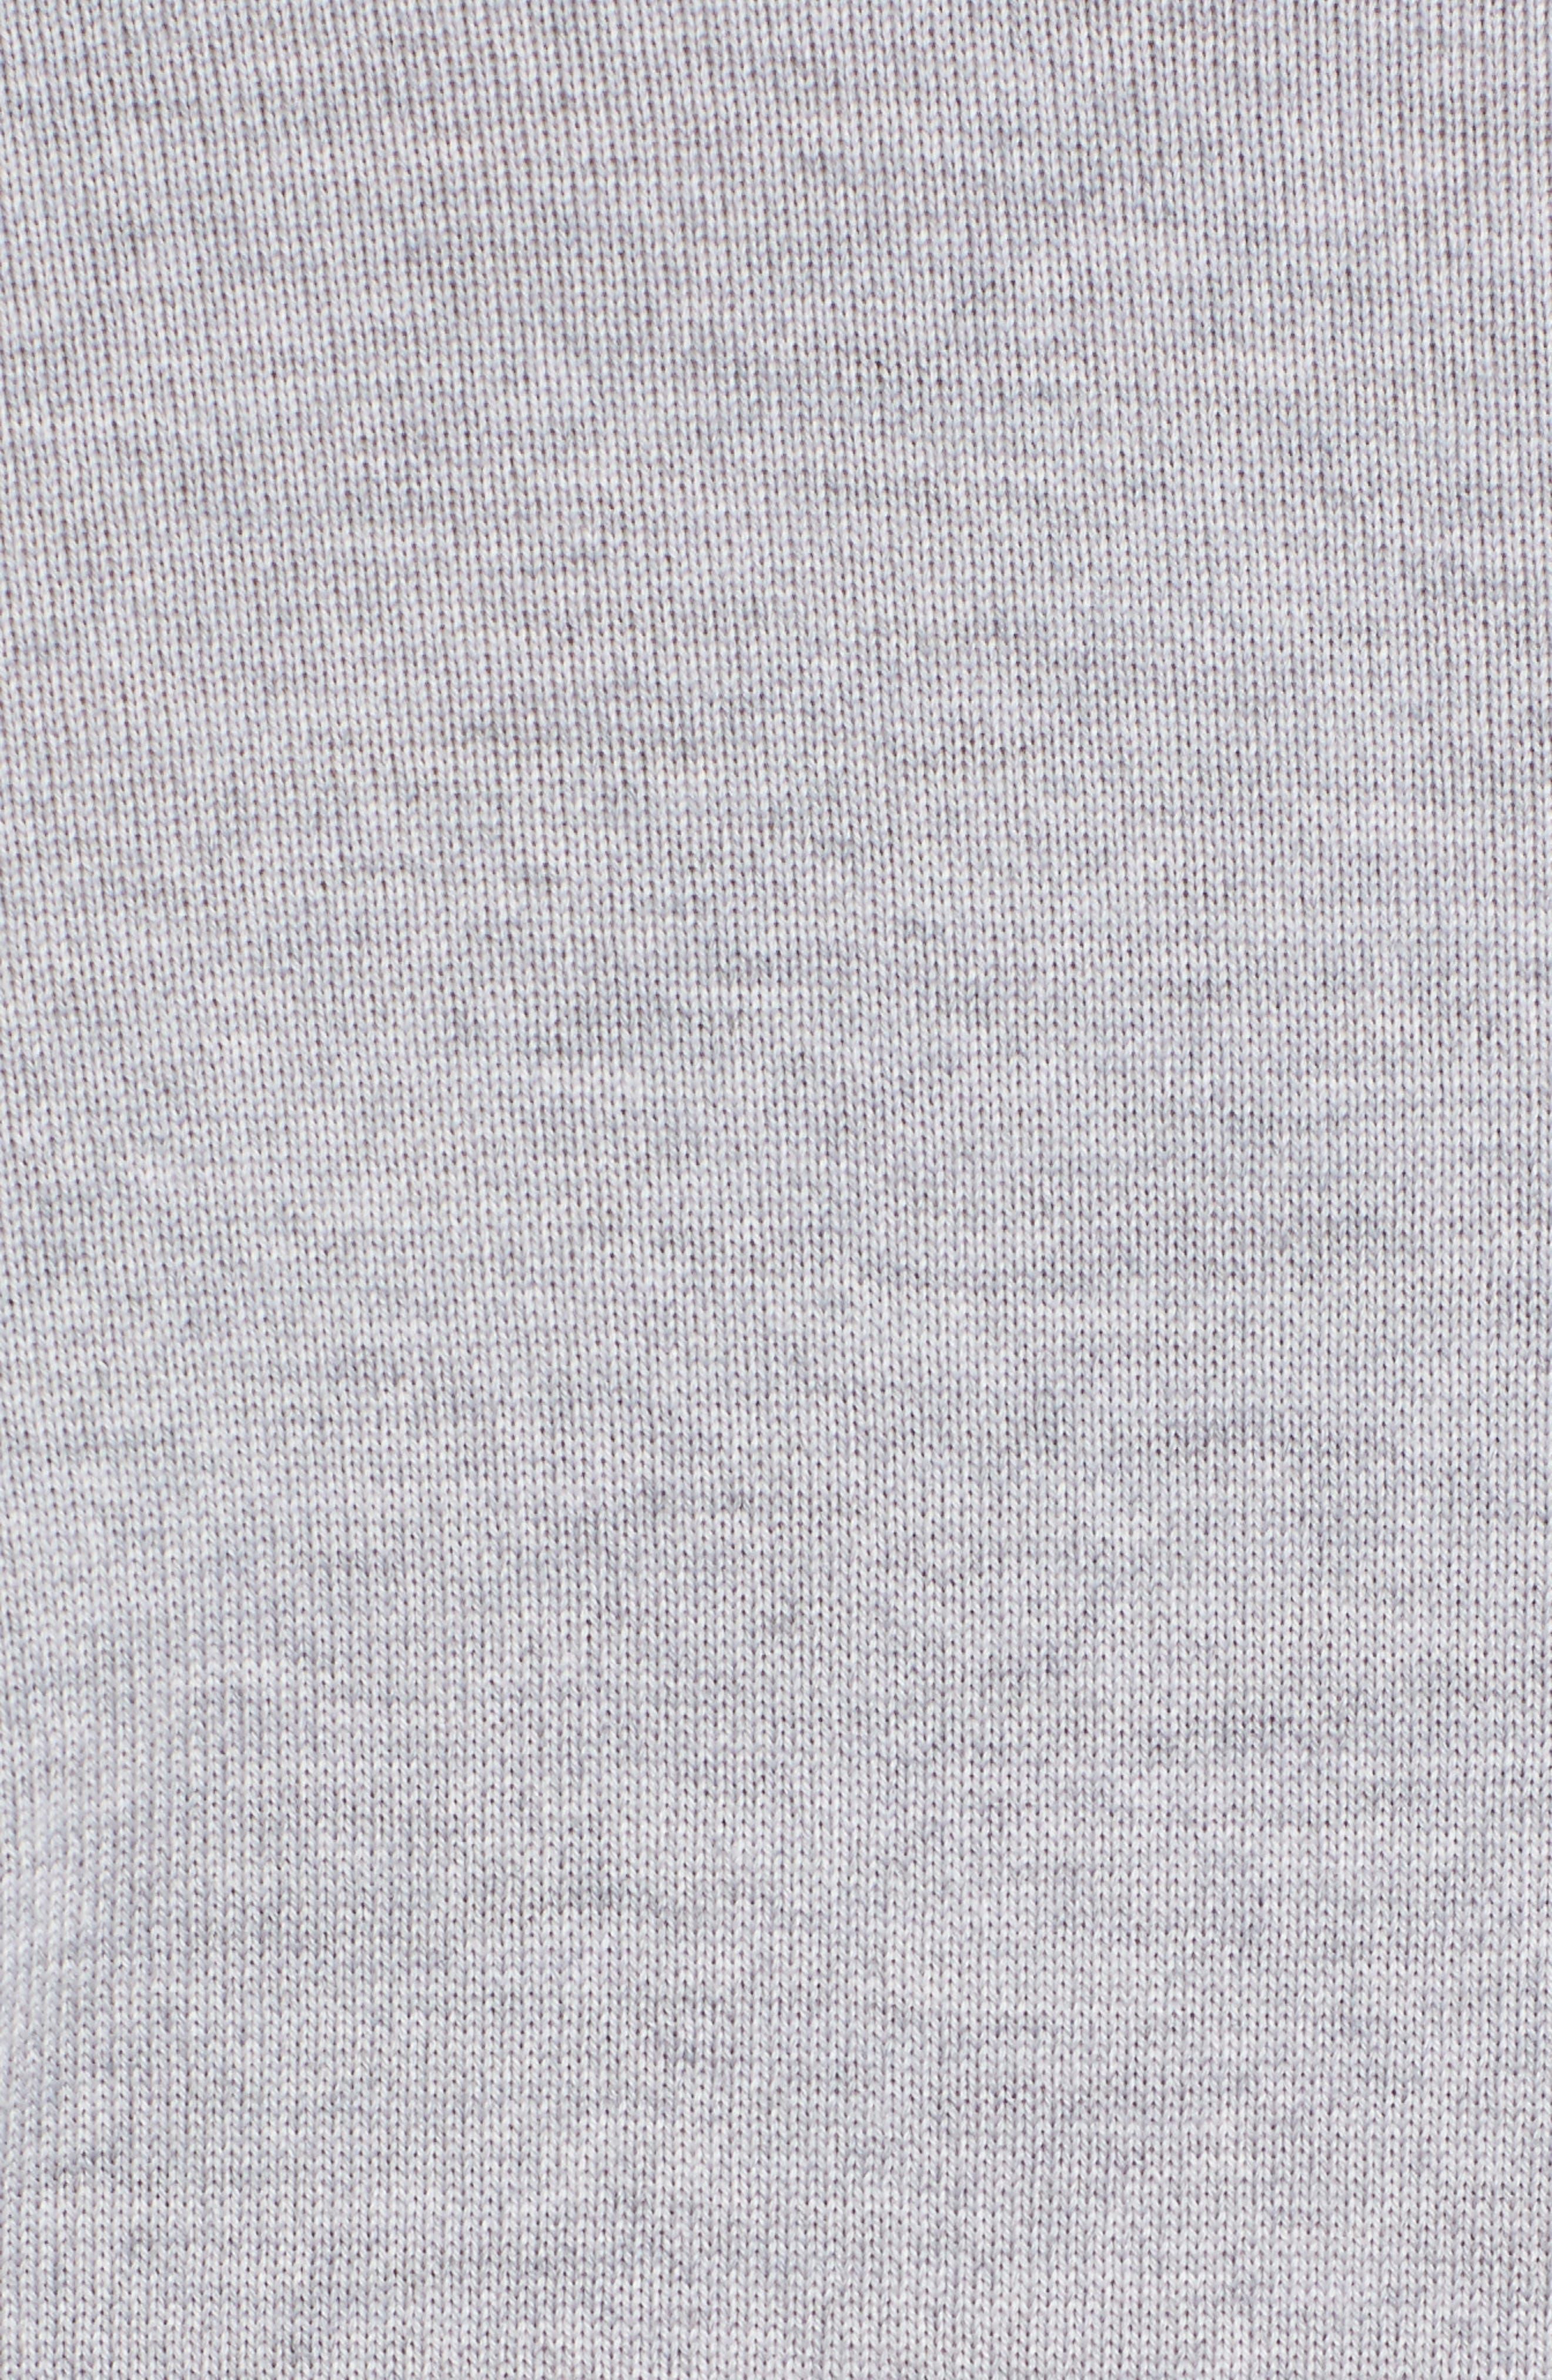 Navello Slim Fit Wool V-Neck Sweater,                             Alternate thumbnail 5, color,                             072